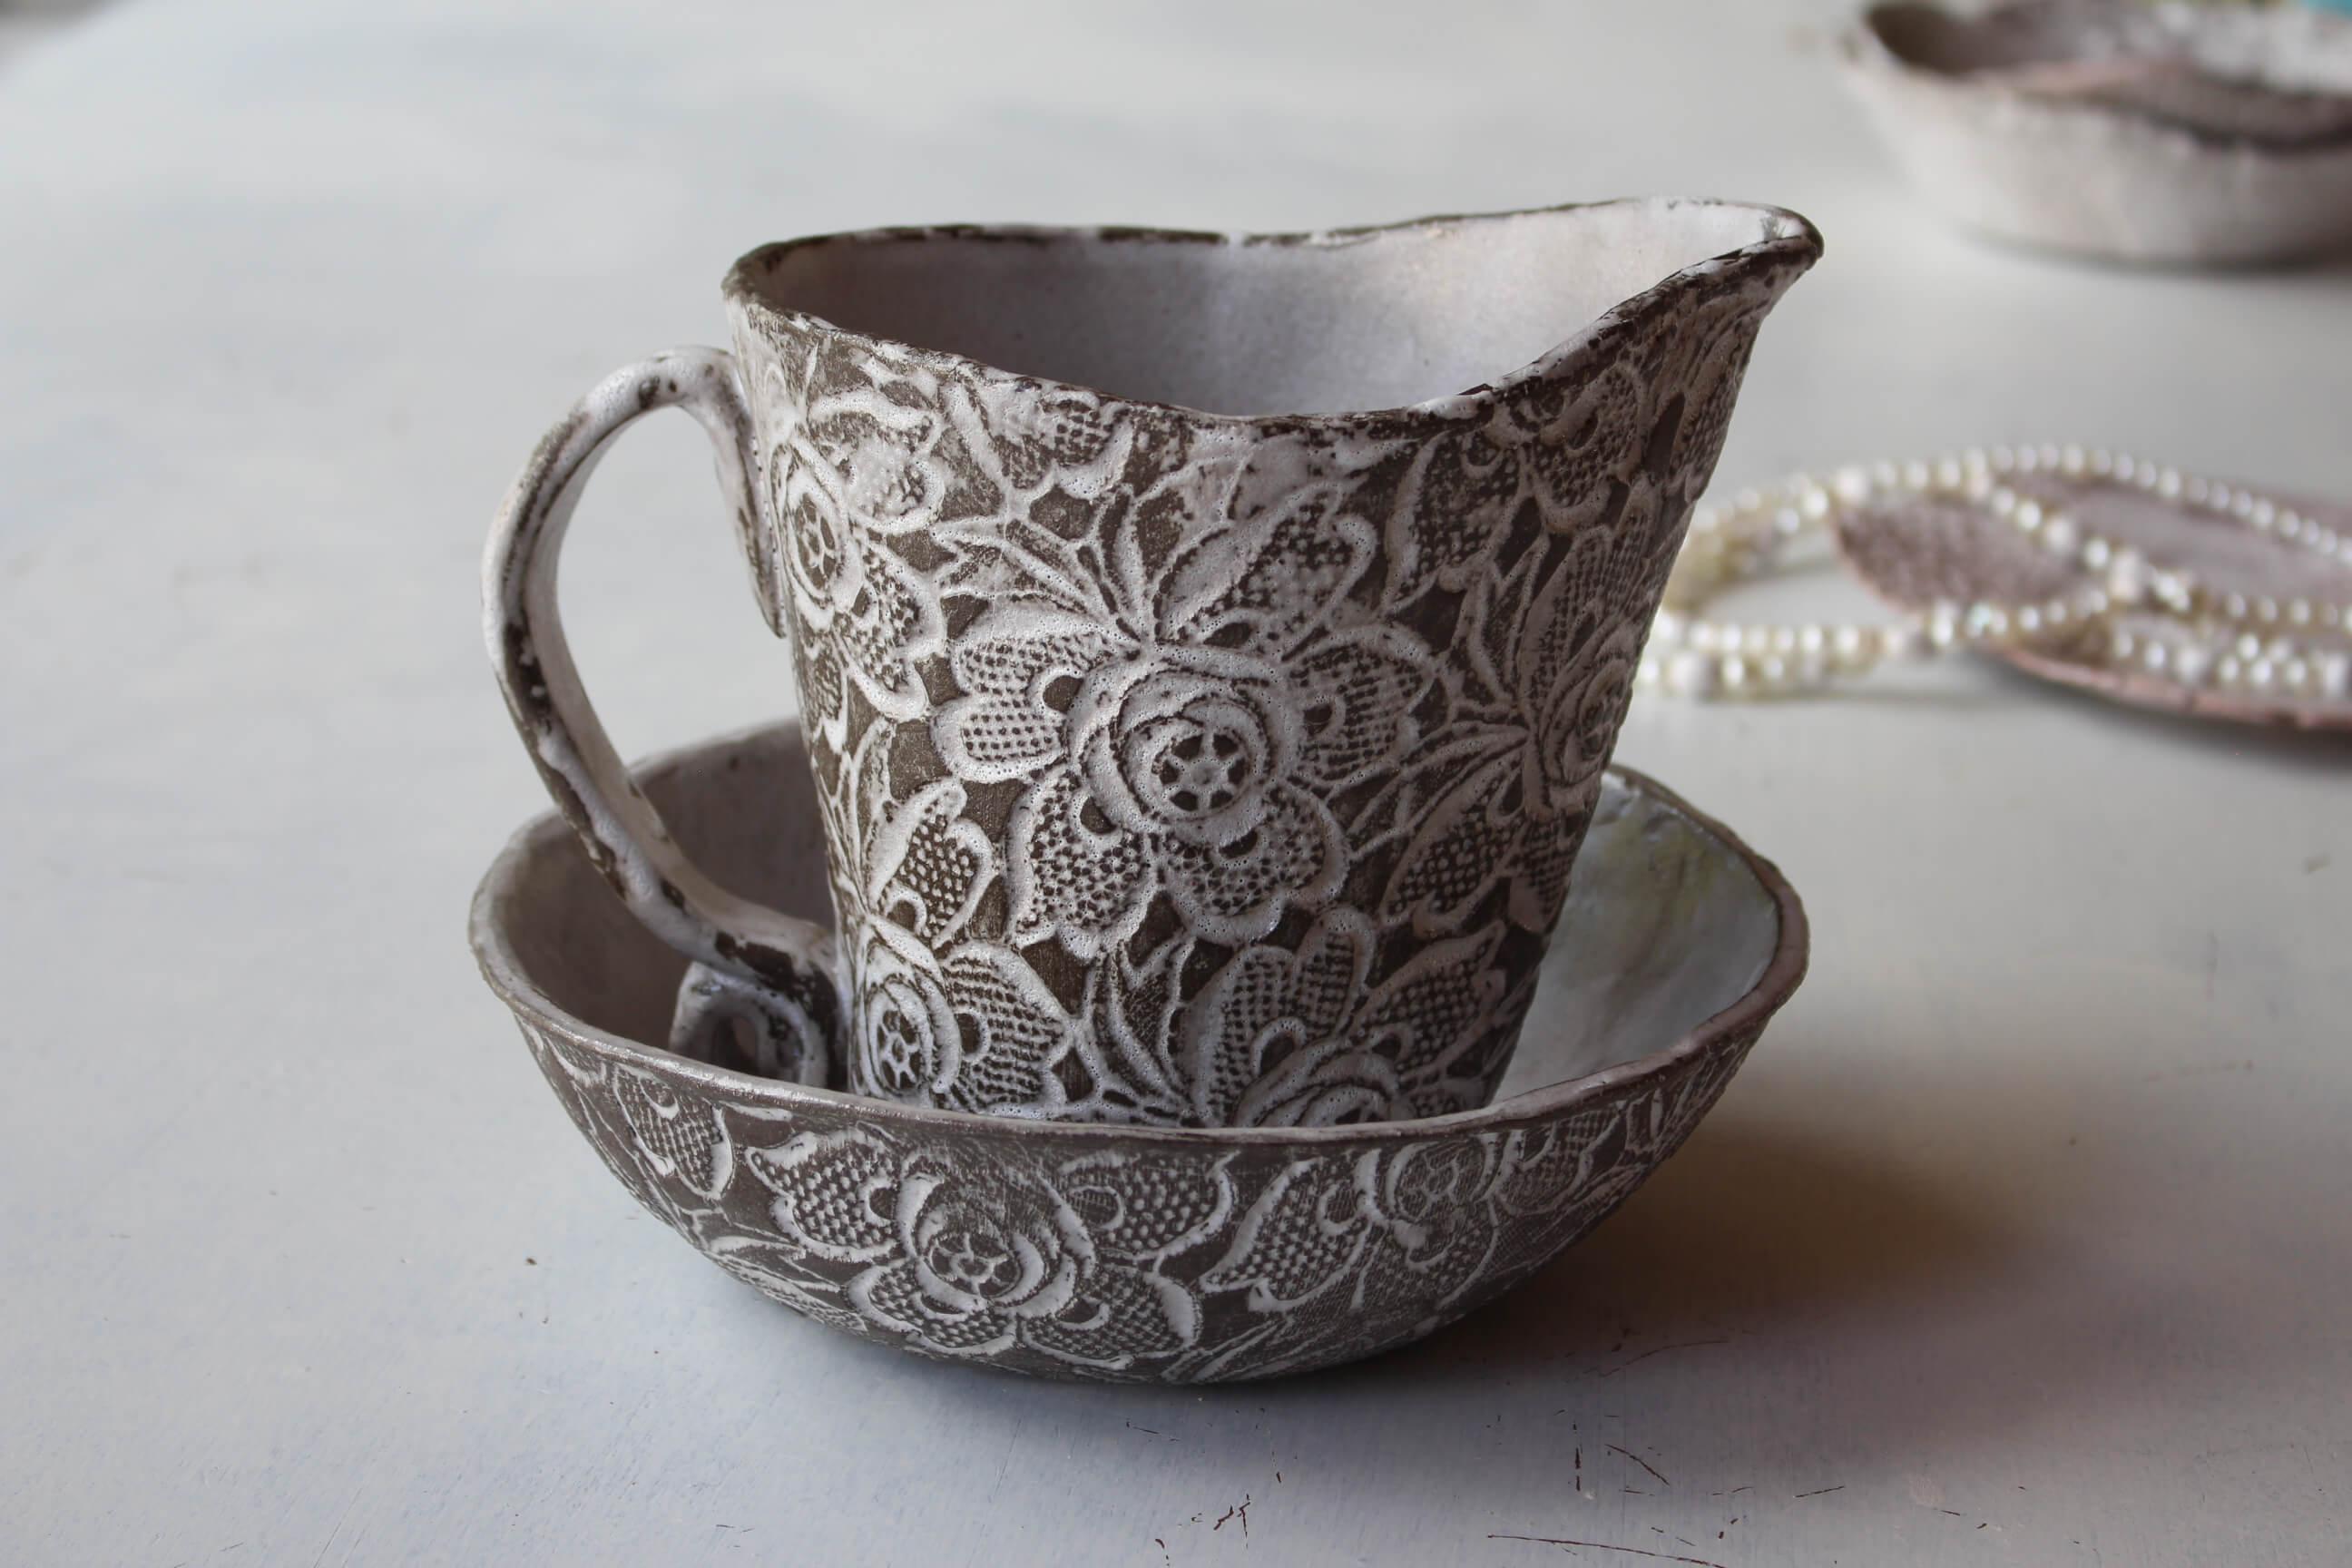 handgemachte keramik keramik sets kaufen keramik shop. Black Bedroom Furniture Sets. Home Design Ideas